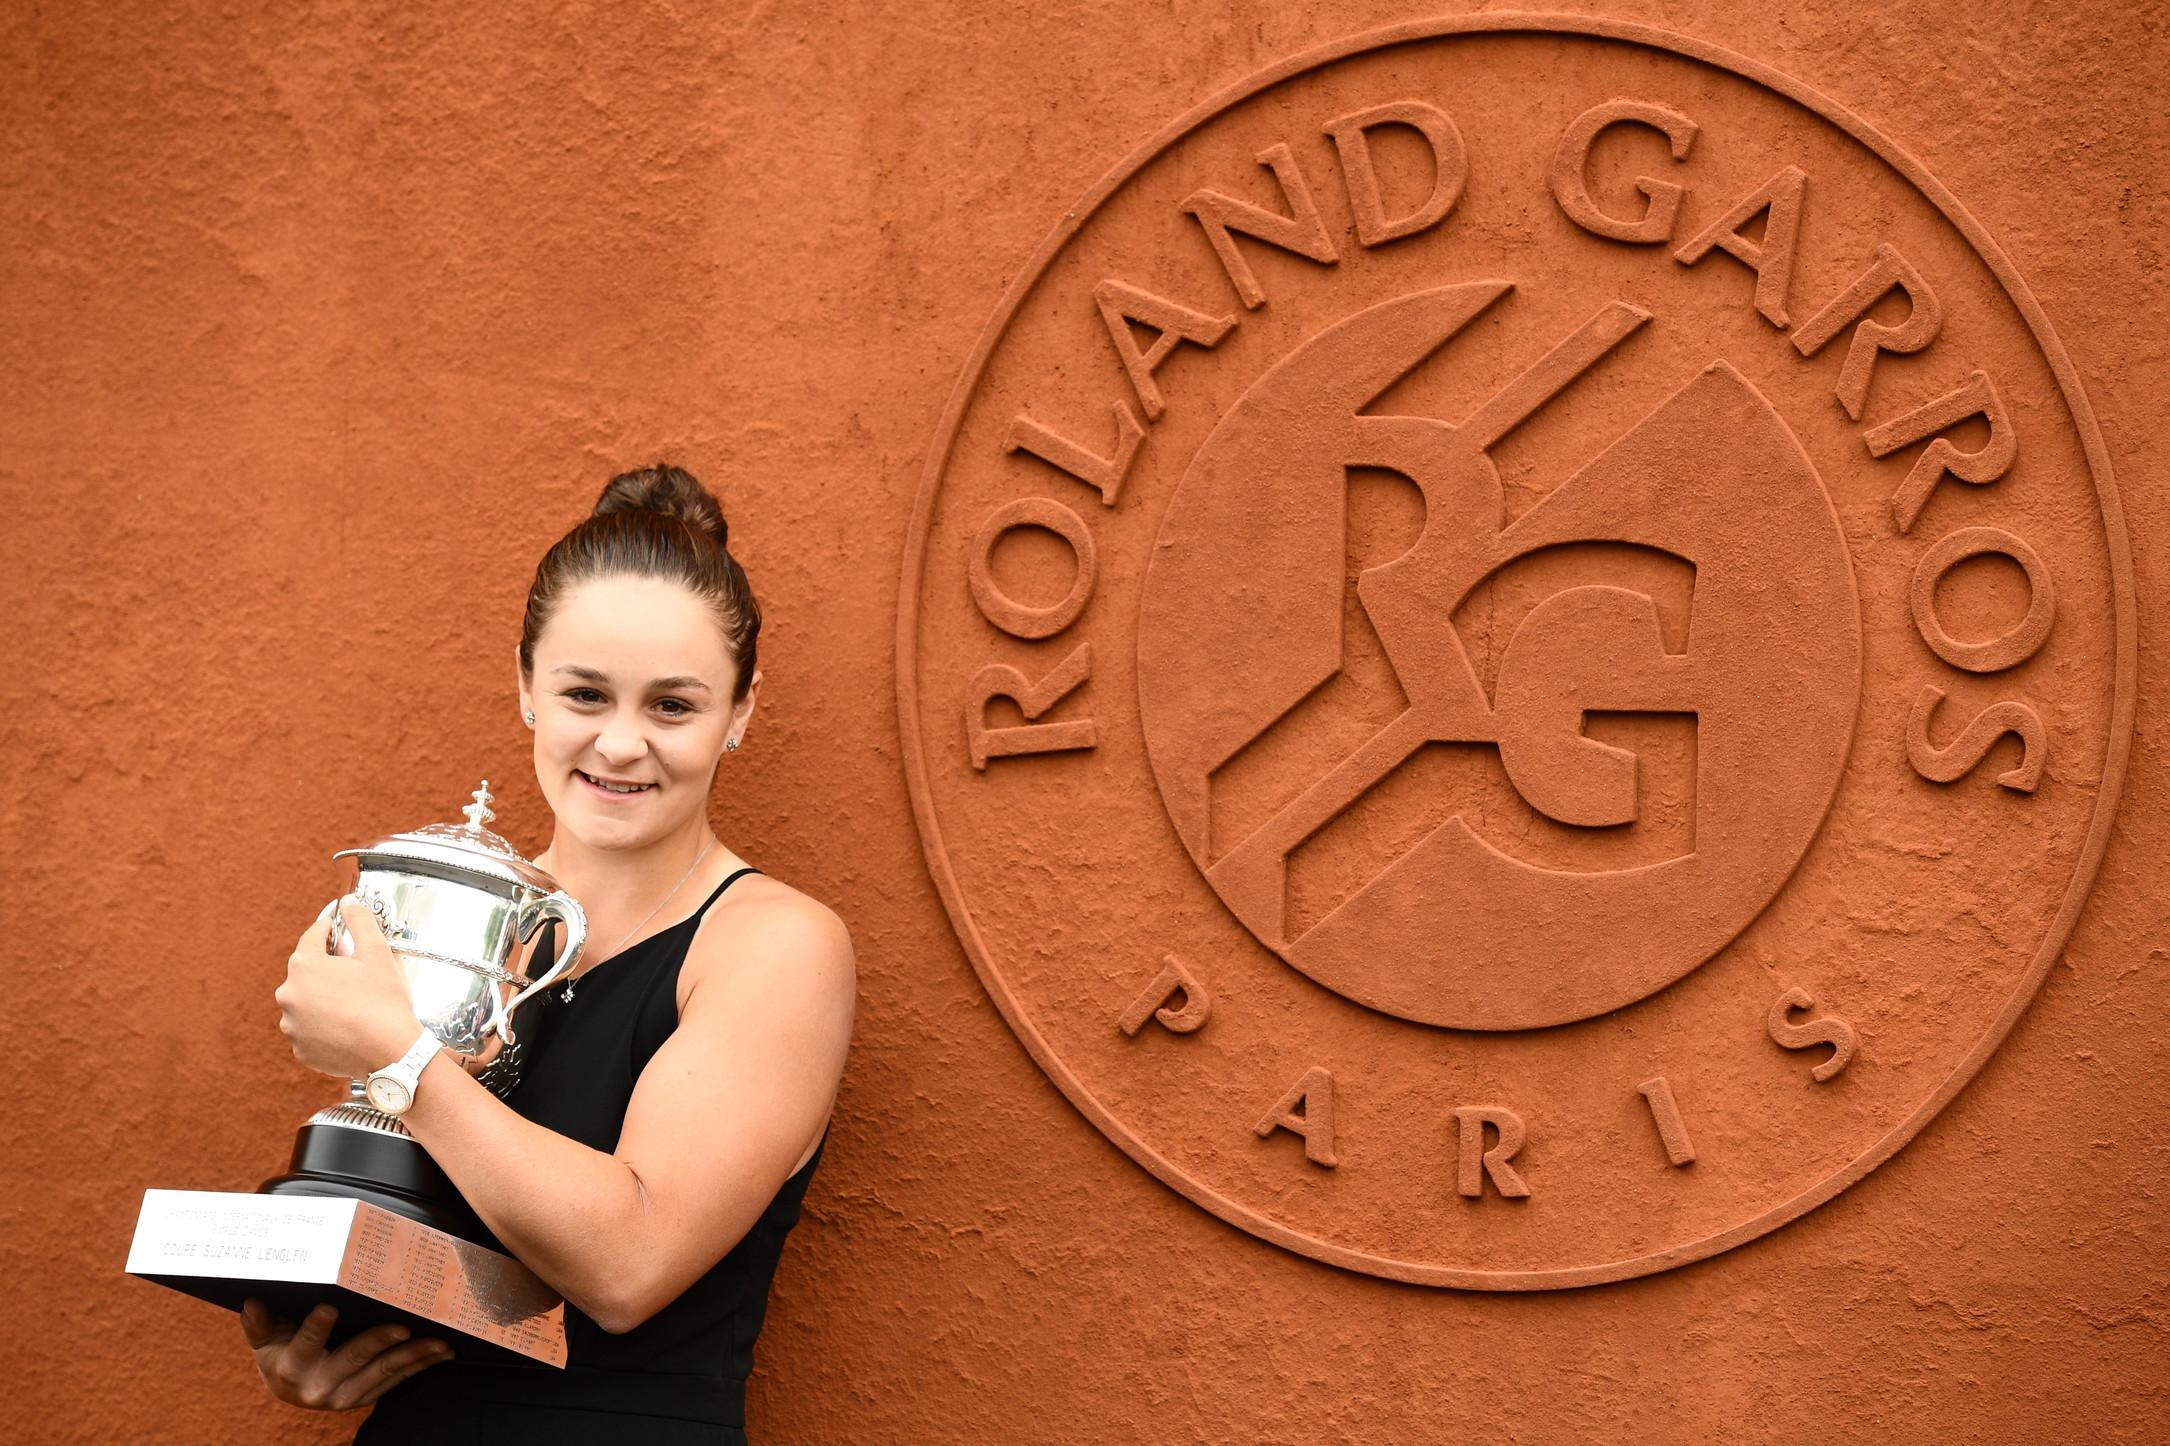 Roland Garros tennis: Ashleigh Barty